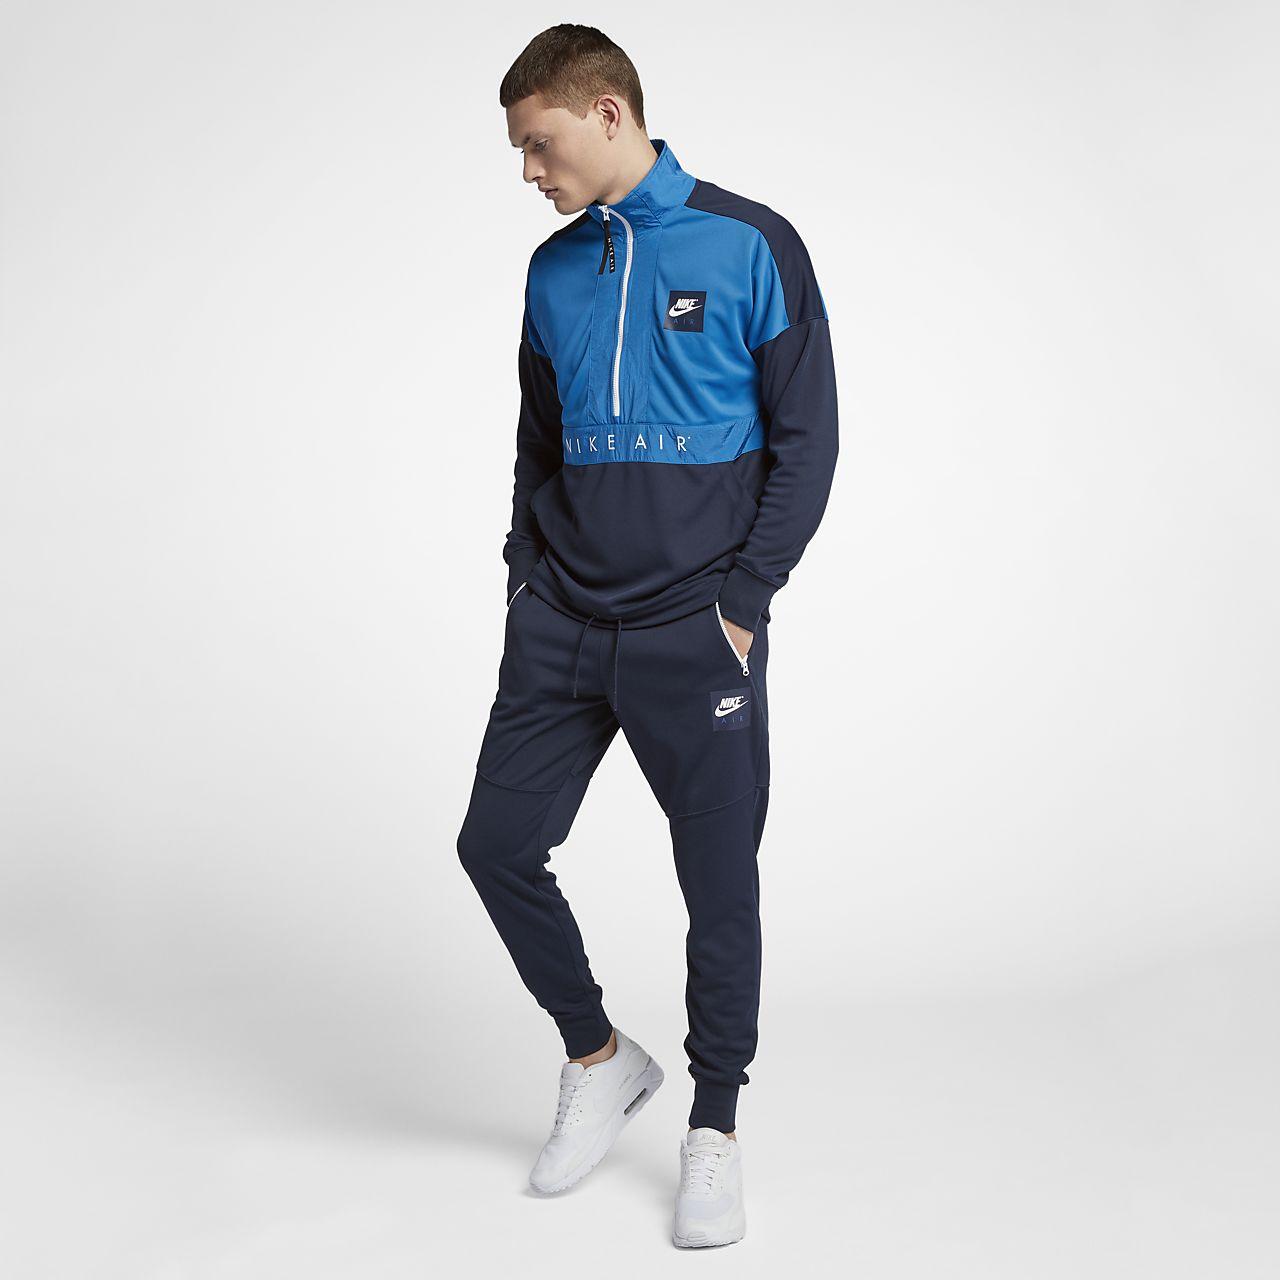 Zip Air To Jacket Nike Saleup Half 39Discounts KF1Jlc